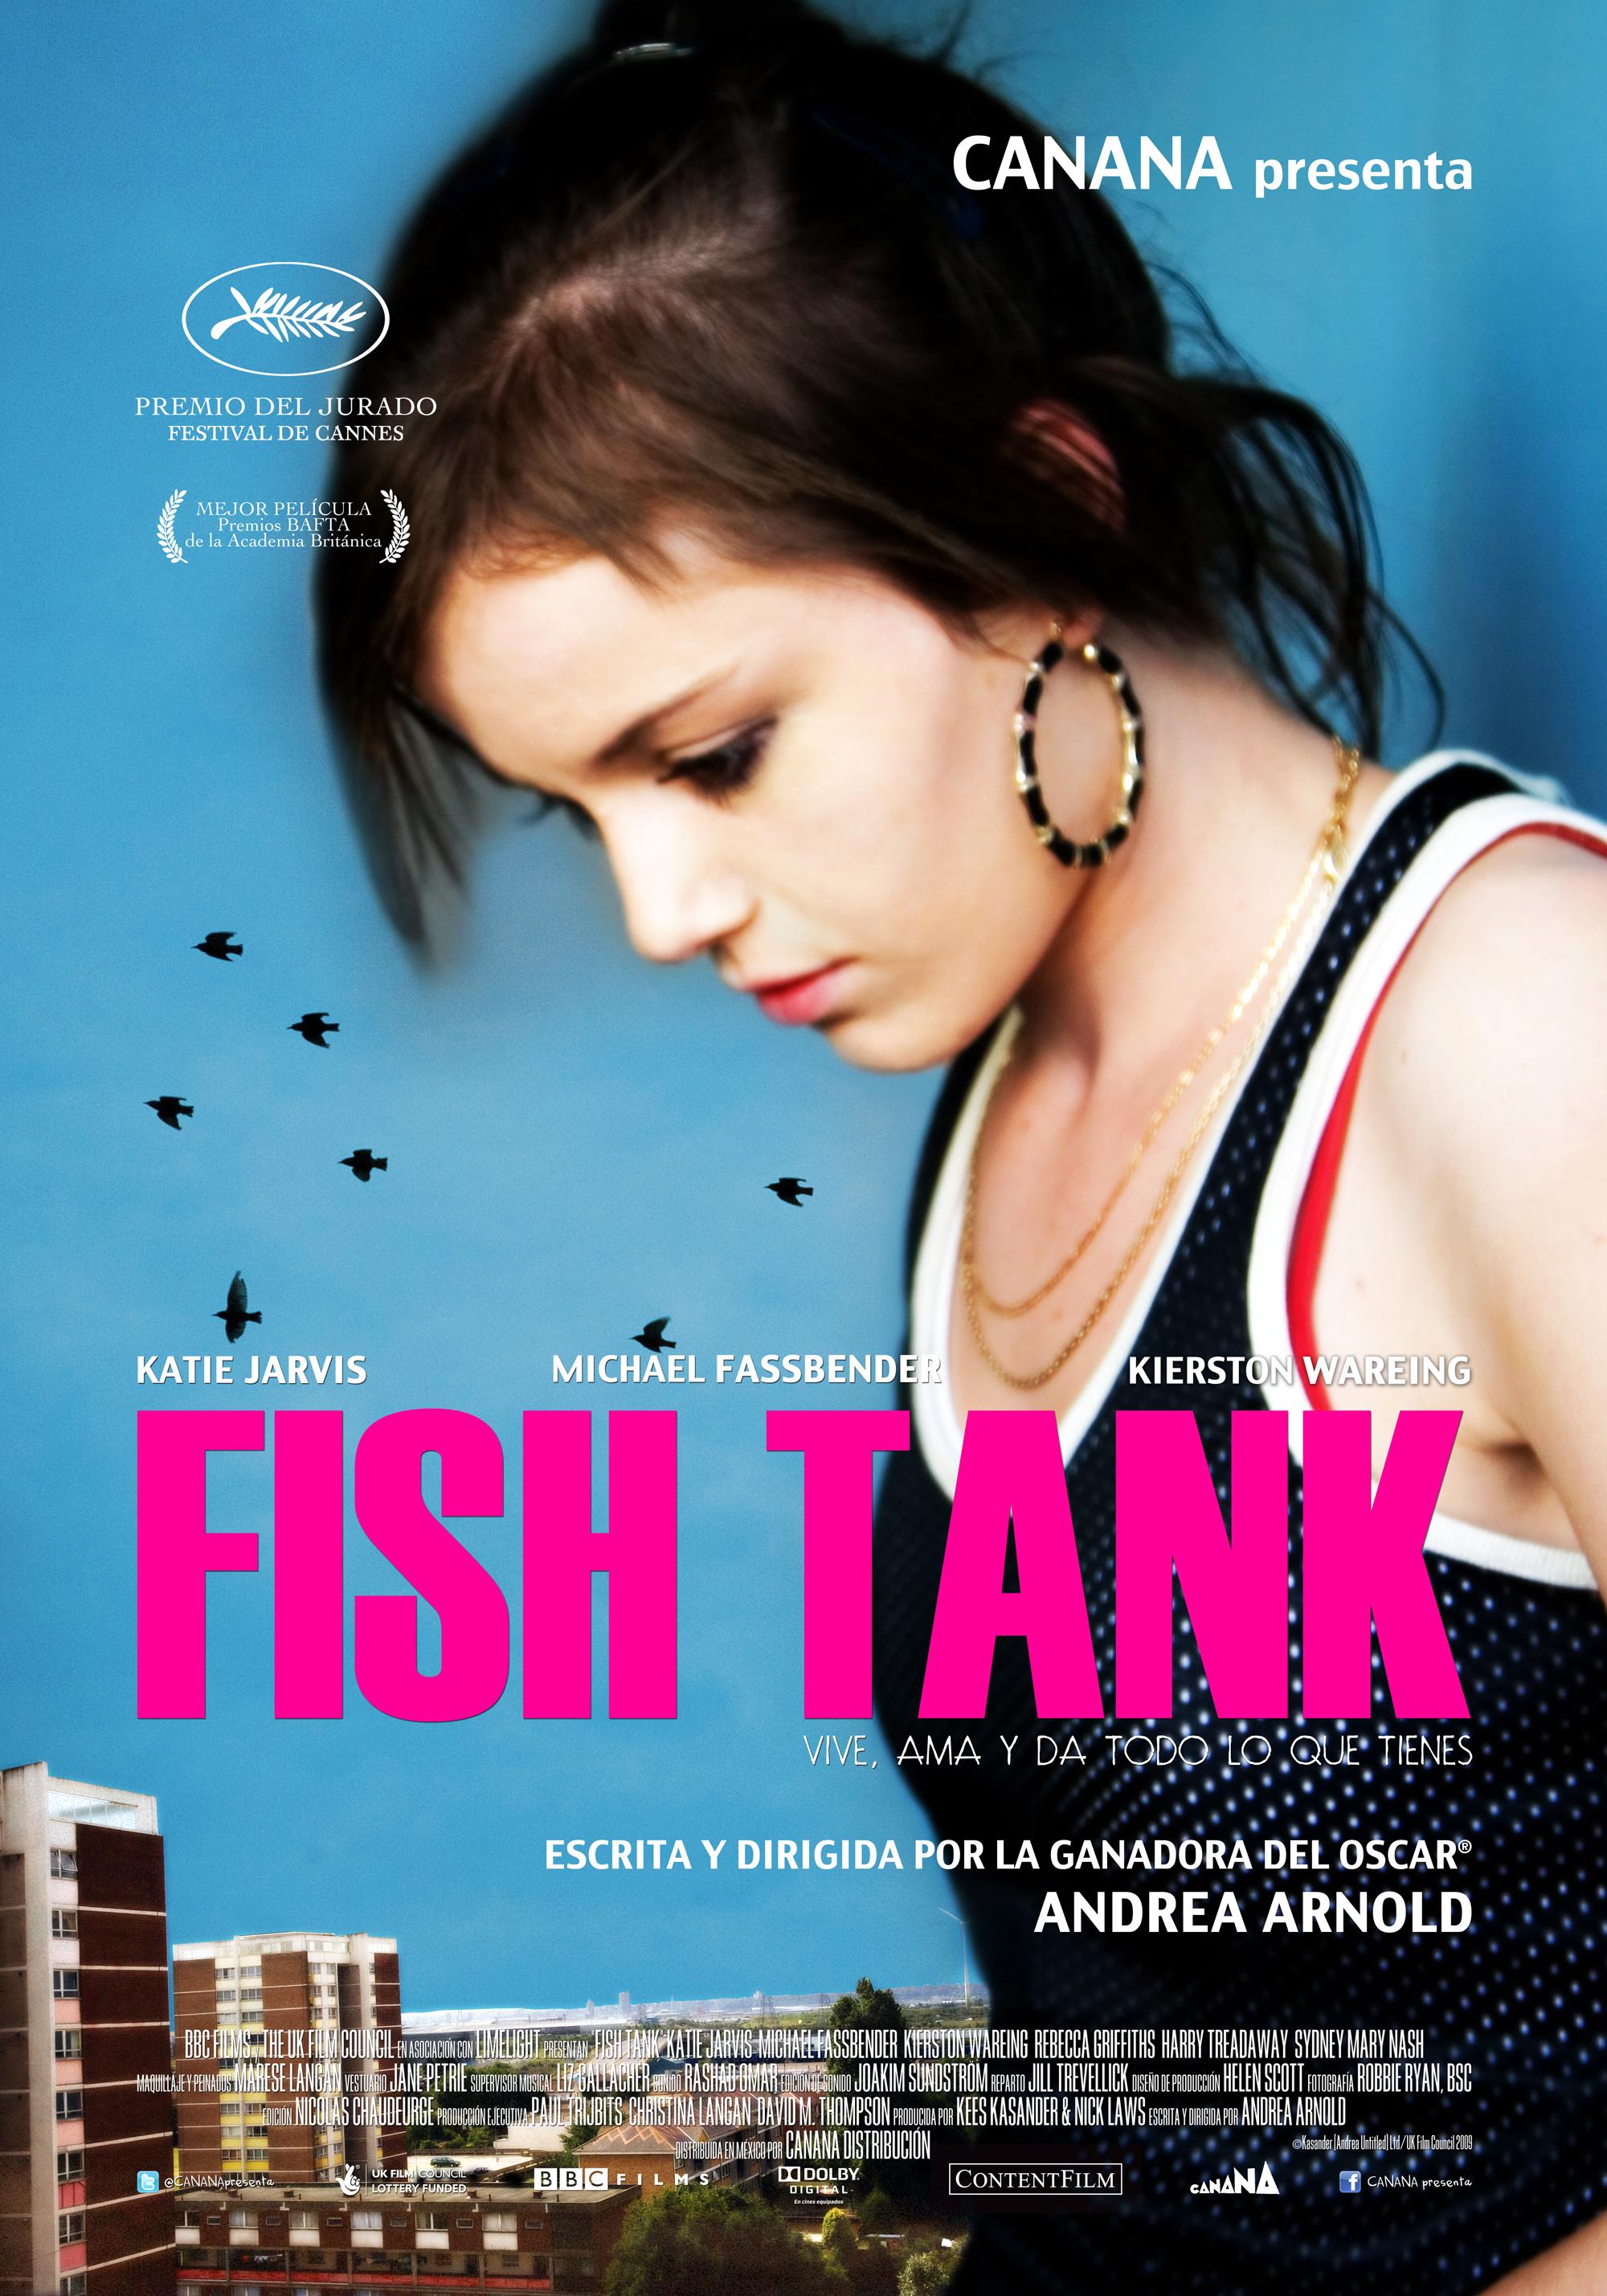 FishTank_Final.jpg